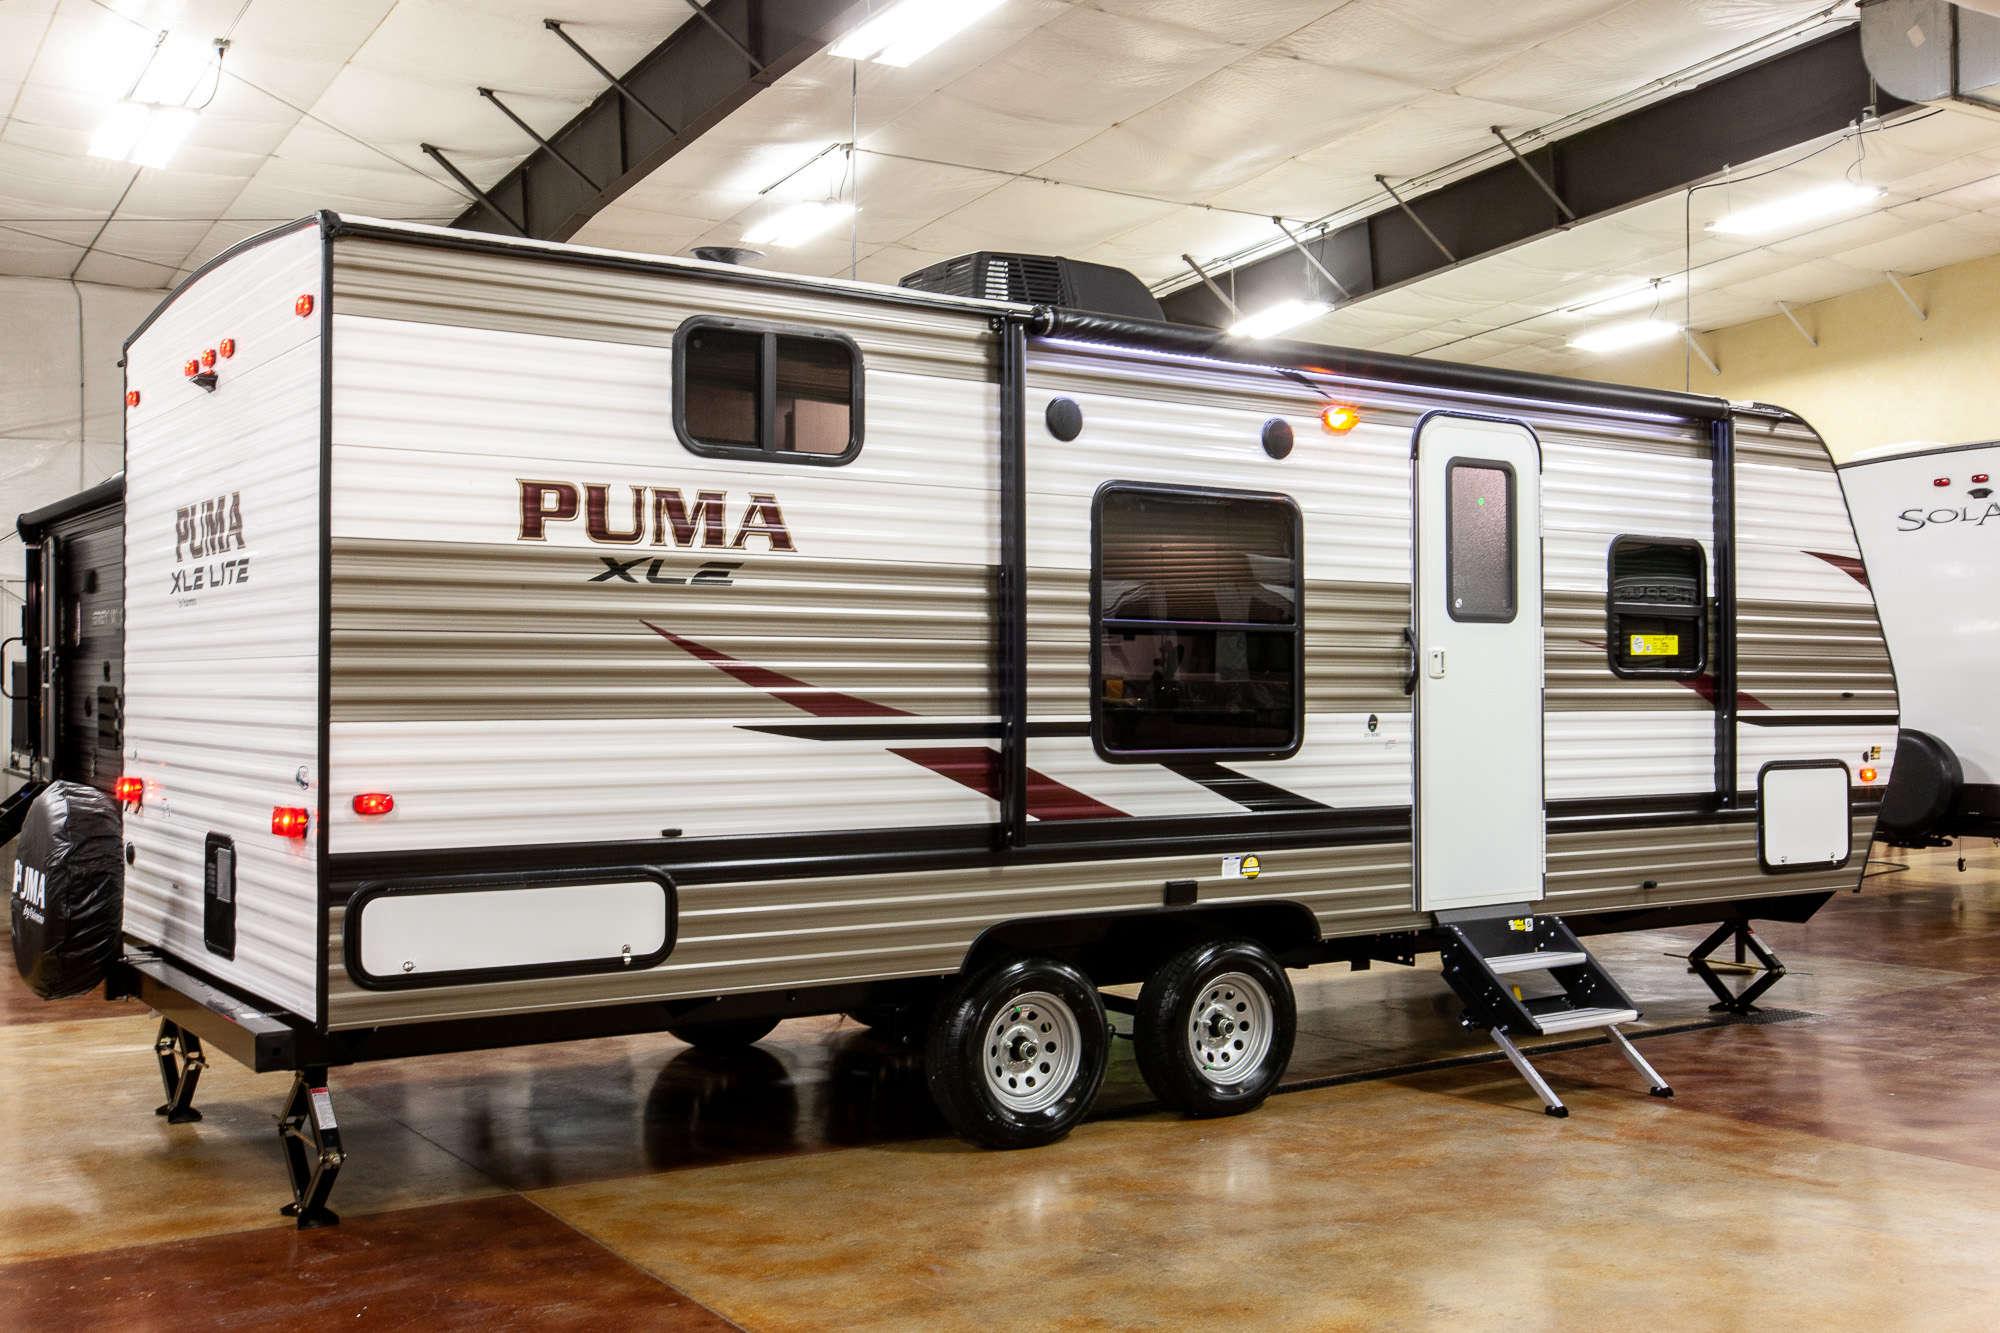 2021 Palomino Puma XLE Lite 20MBC Bunkhouse Travel Trailer Exterior Image